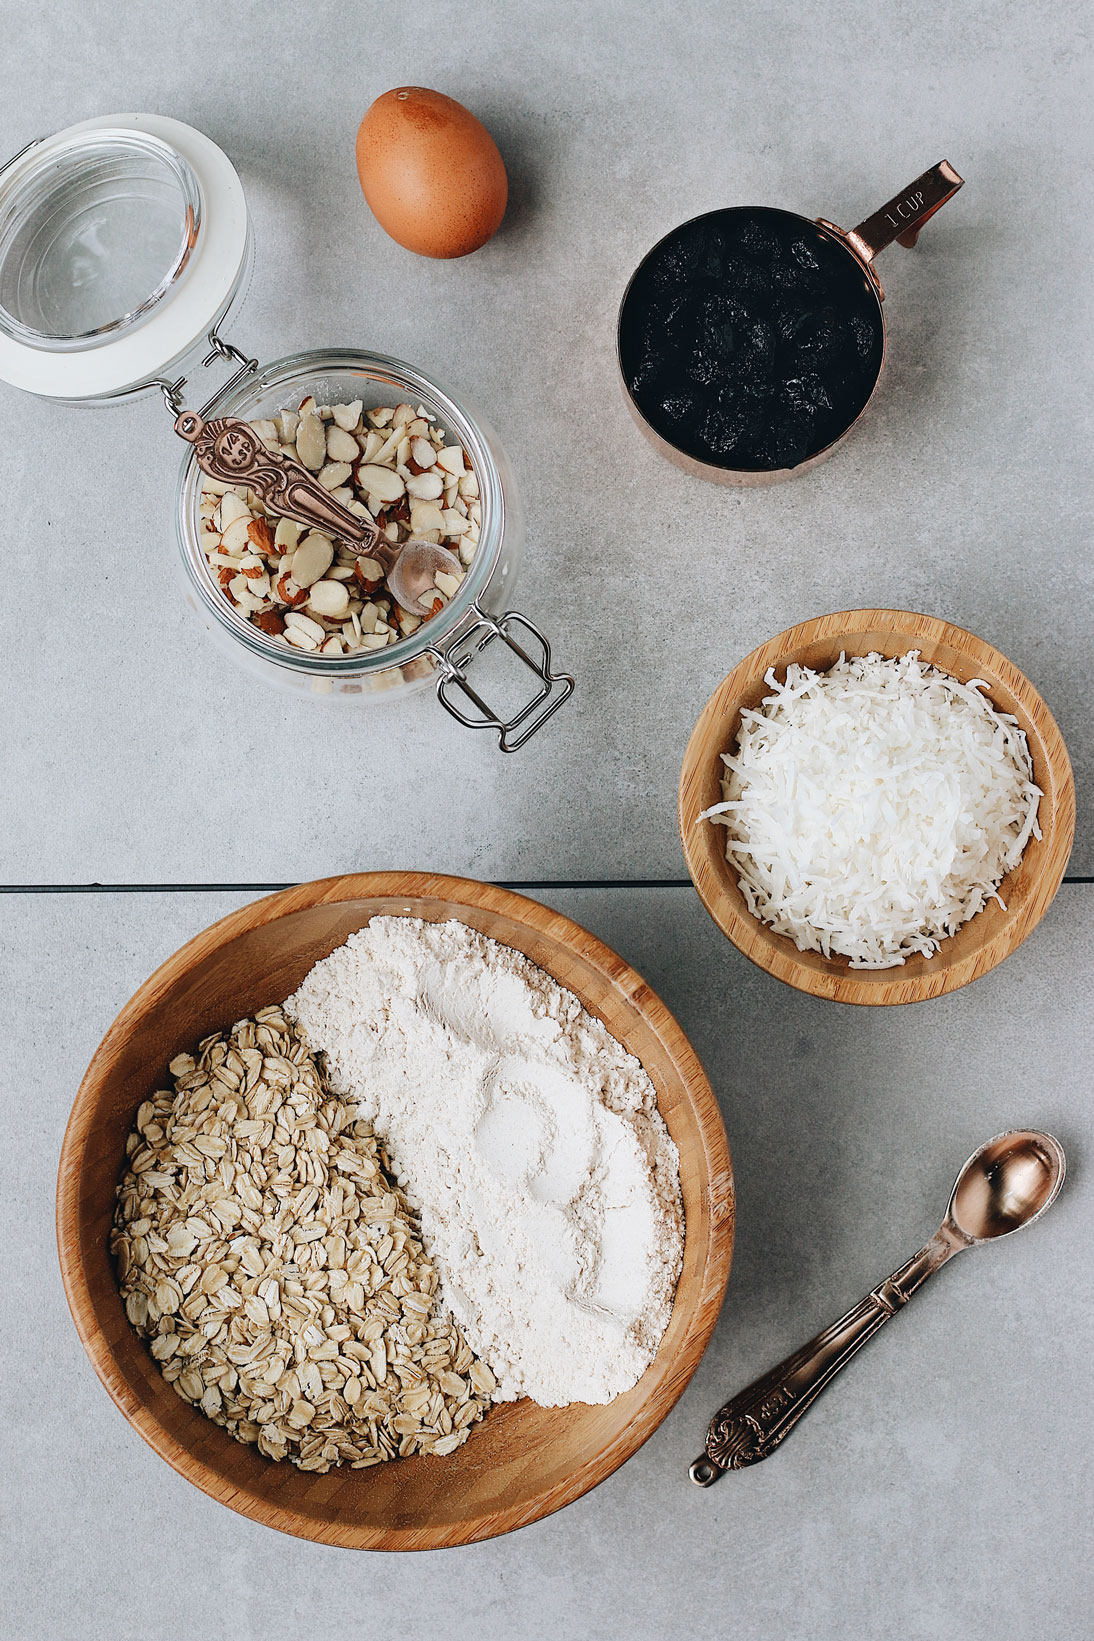 granola-biscotti-prep-oatmeal-shredded-coconut-raisins